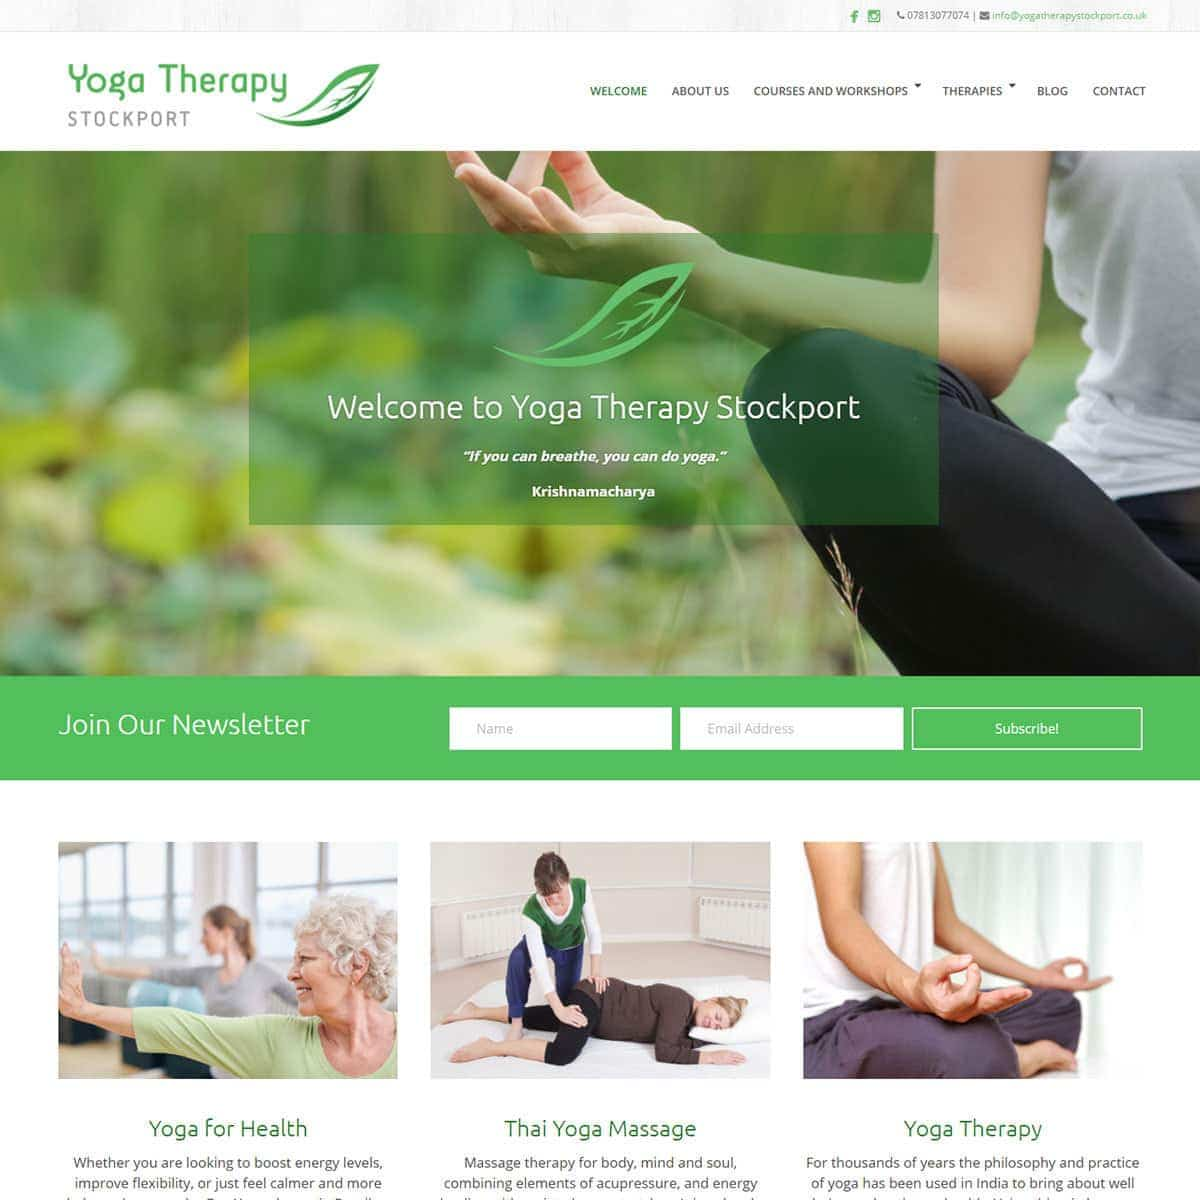 yogatherapystockport